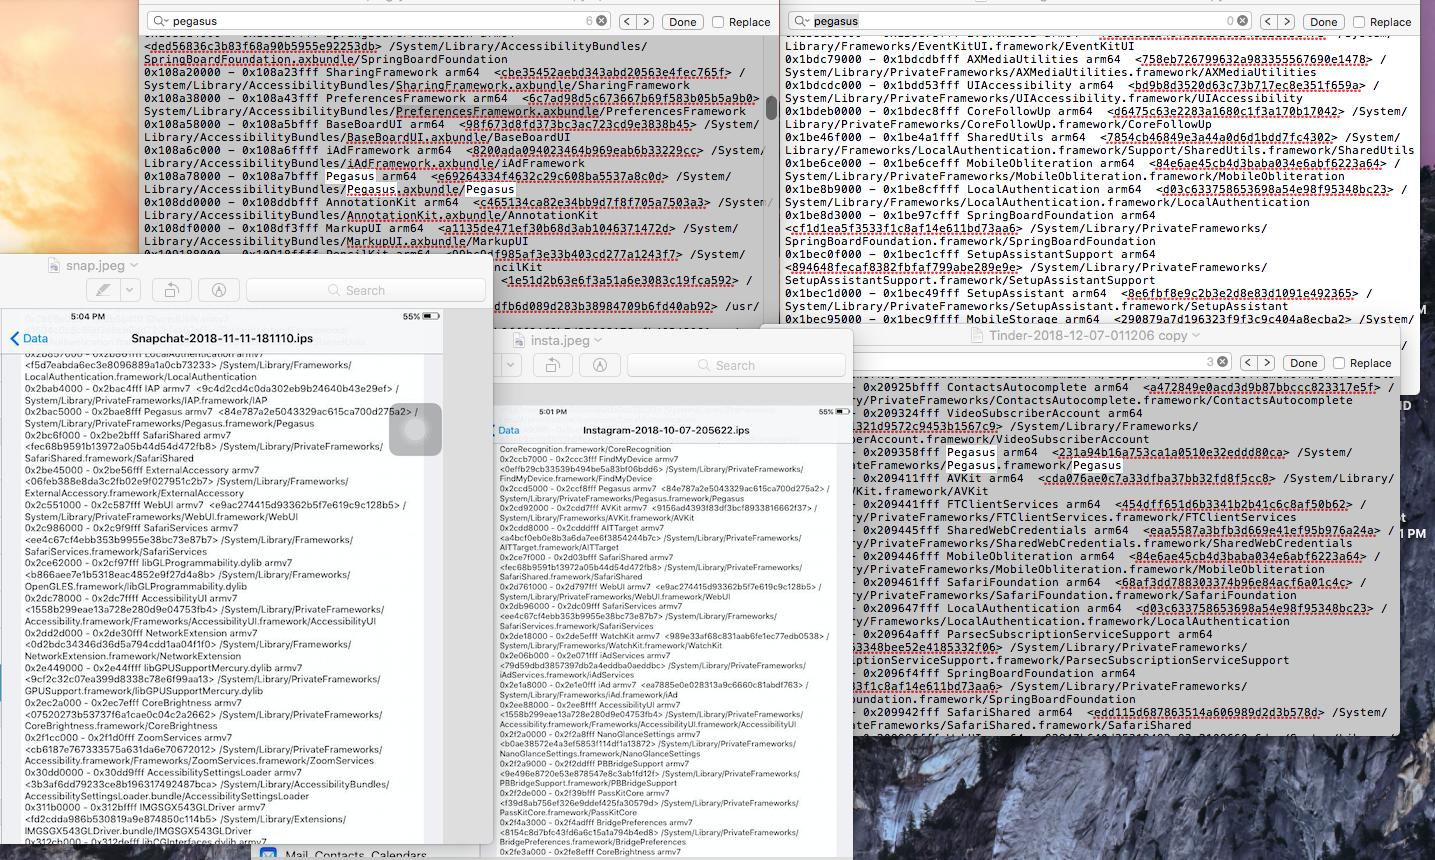 pegasus/mobile obliteration in apps runni… - Apple Community